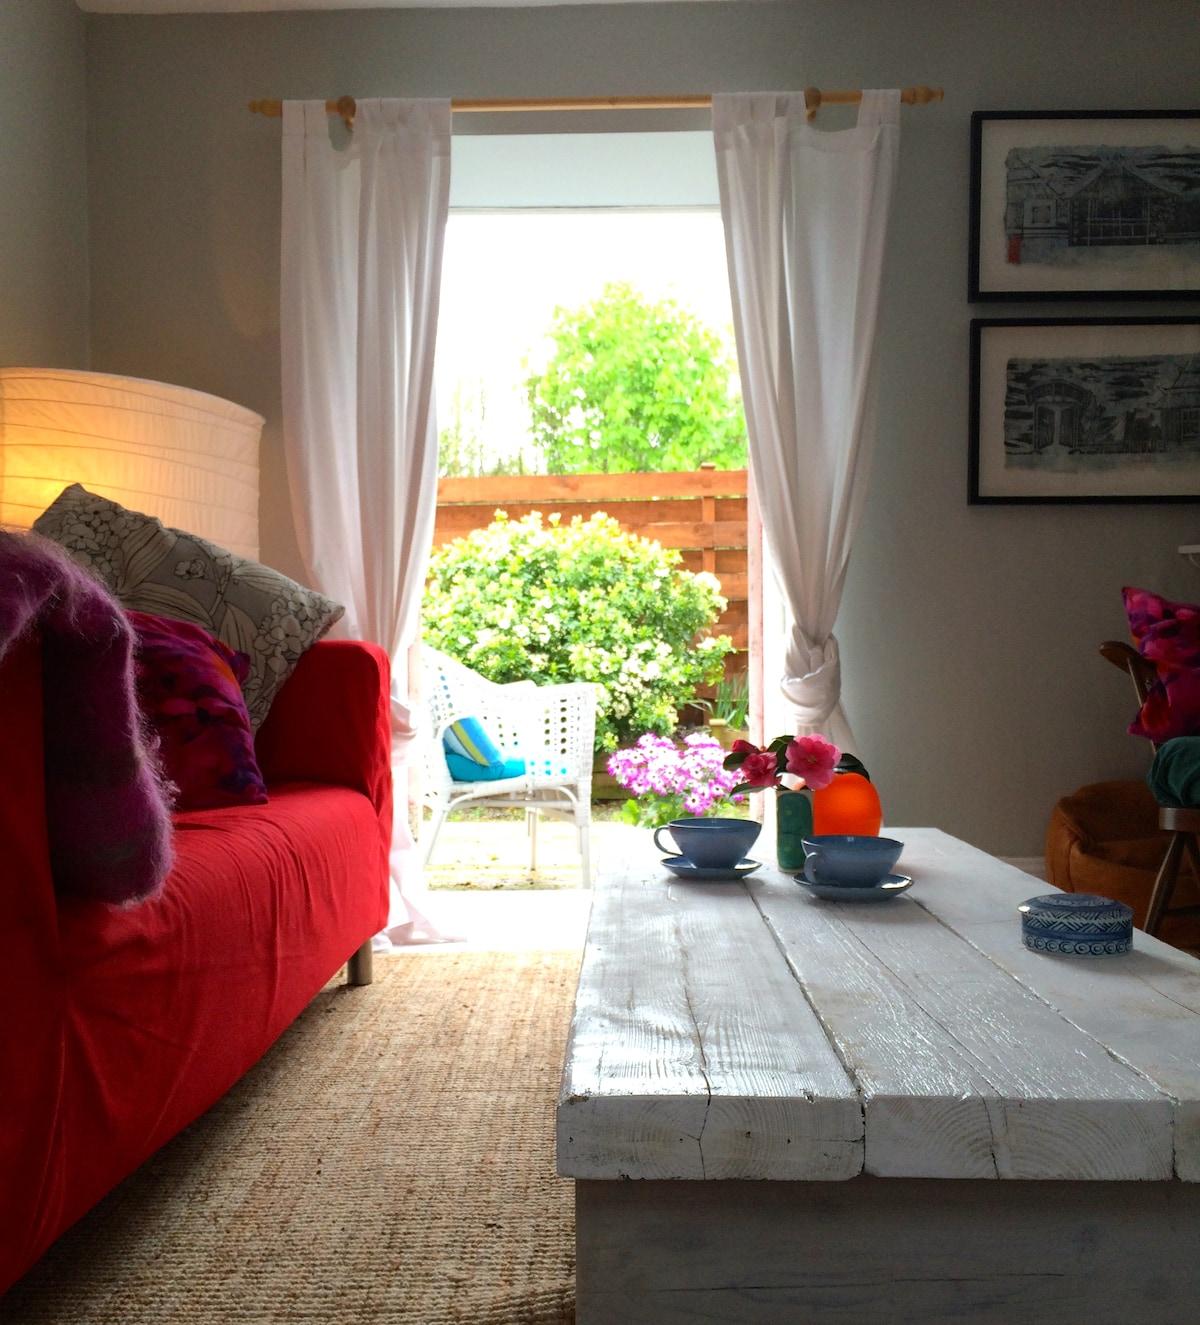 Kilkenny cottage. Charming - cosy